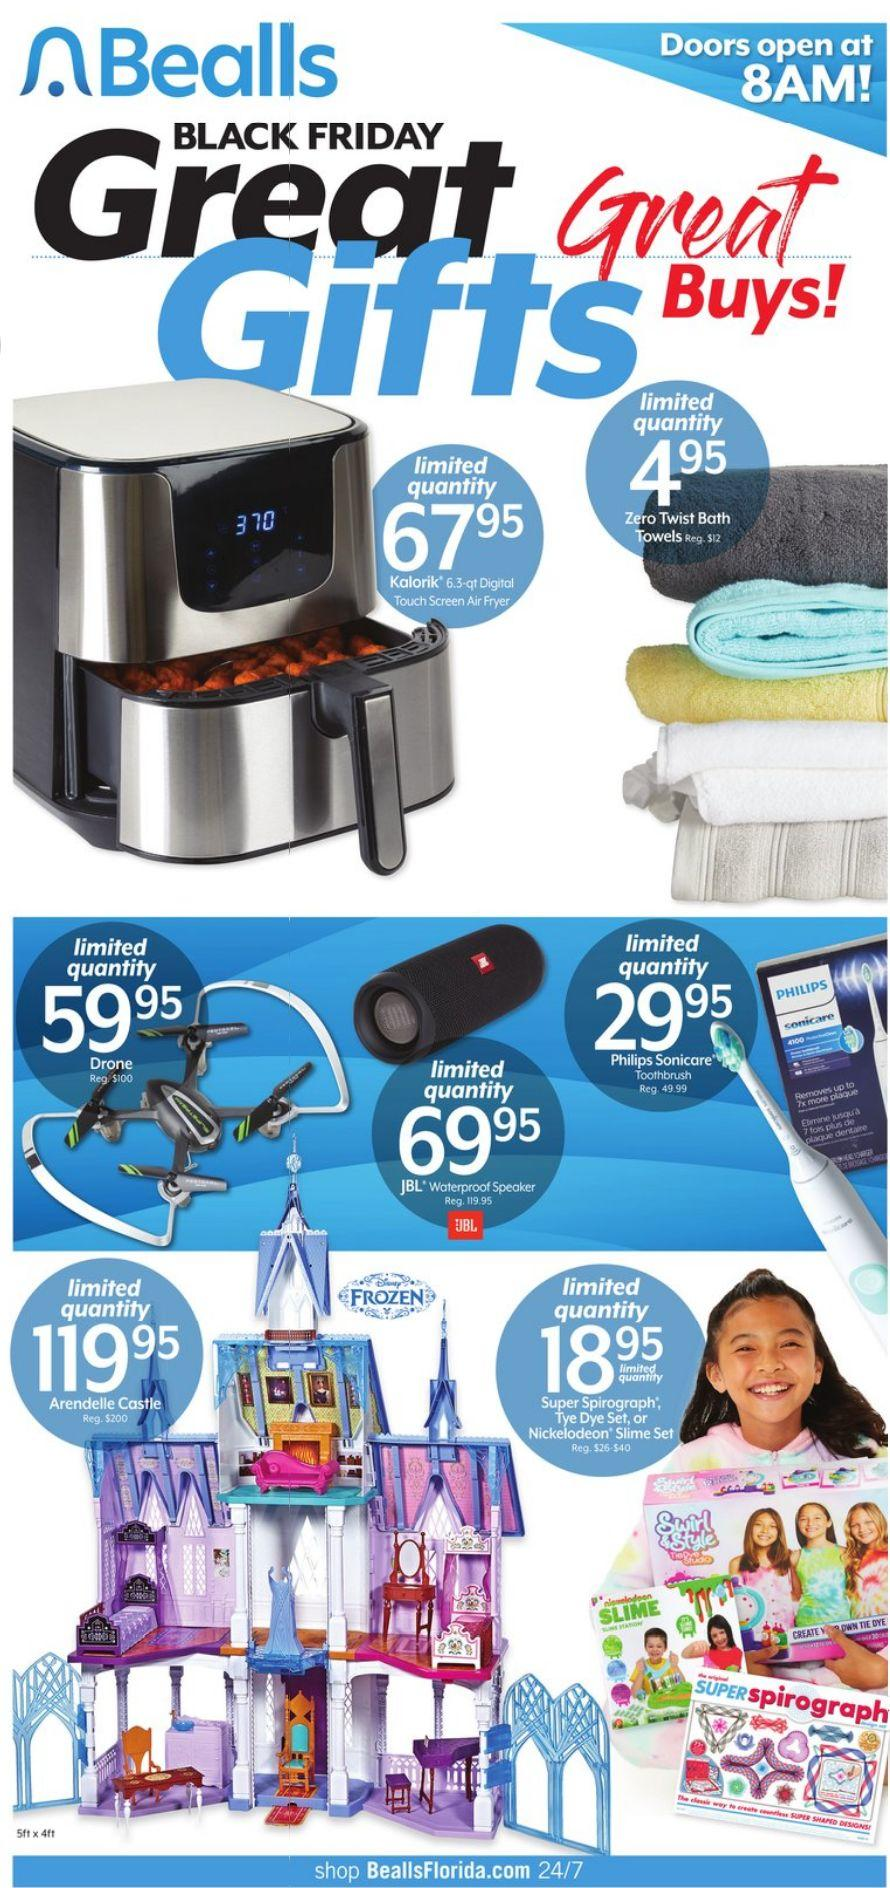 Bealls Black Friday Sales Ad 2020